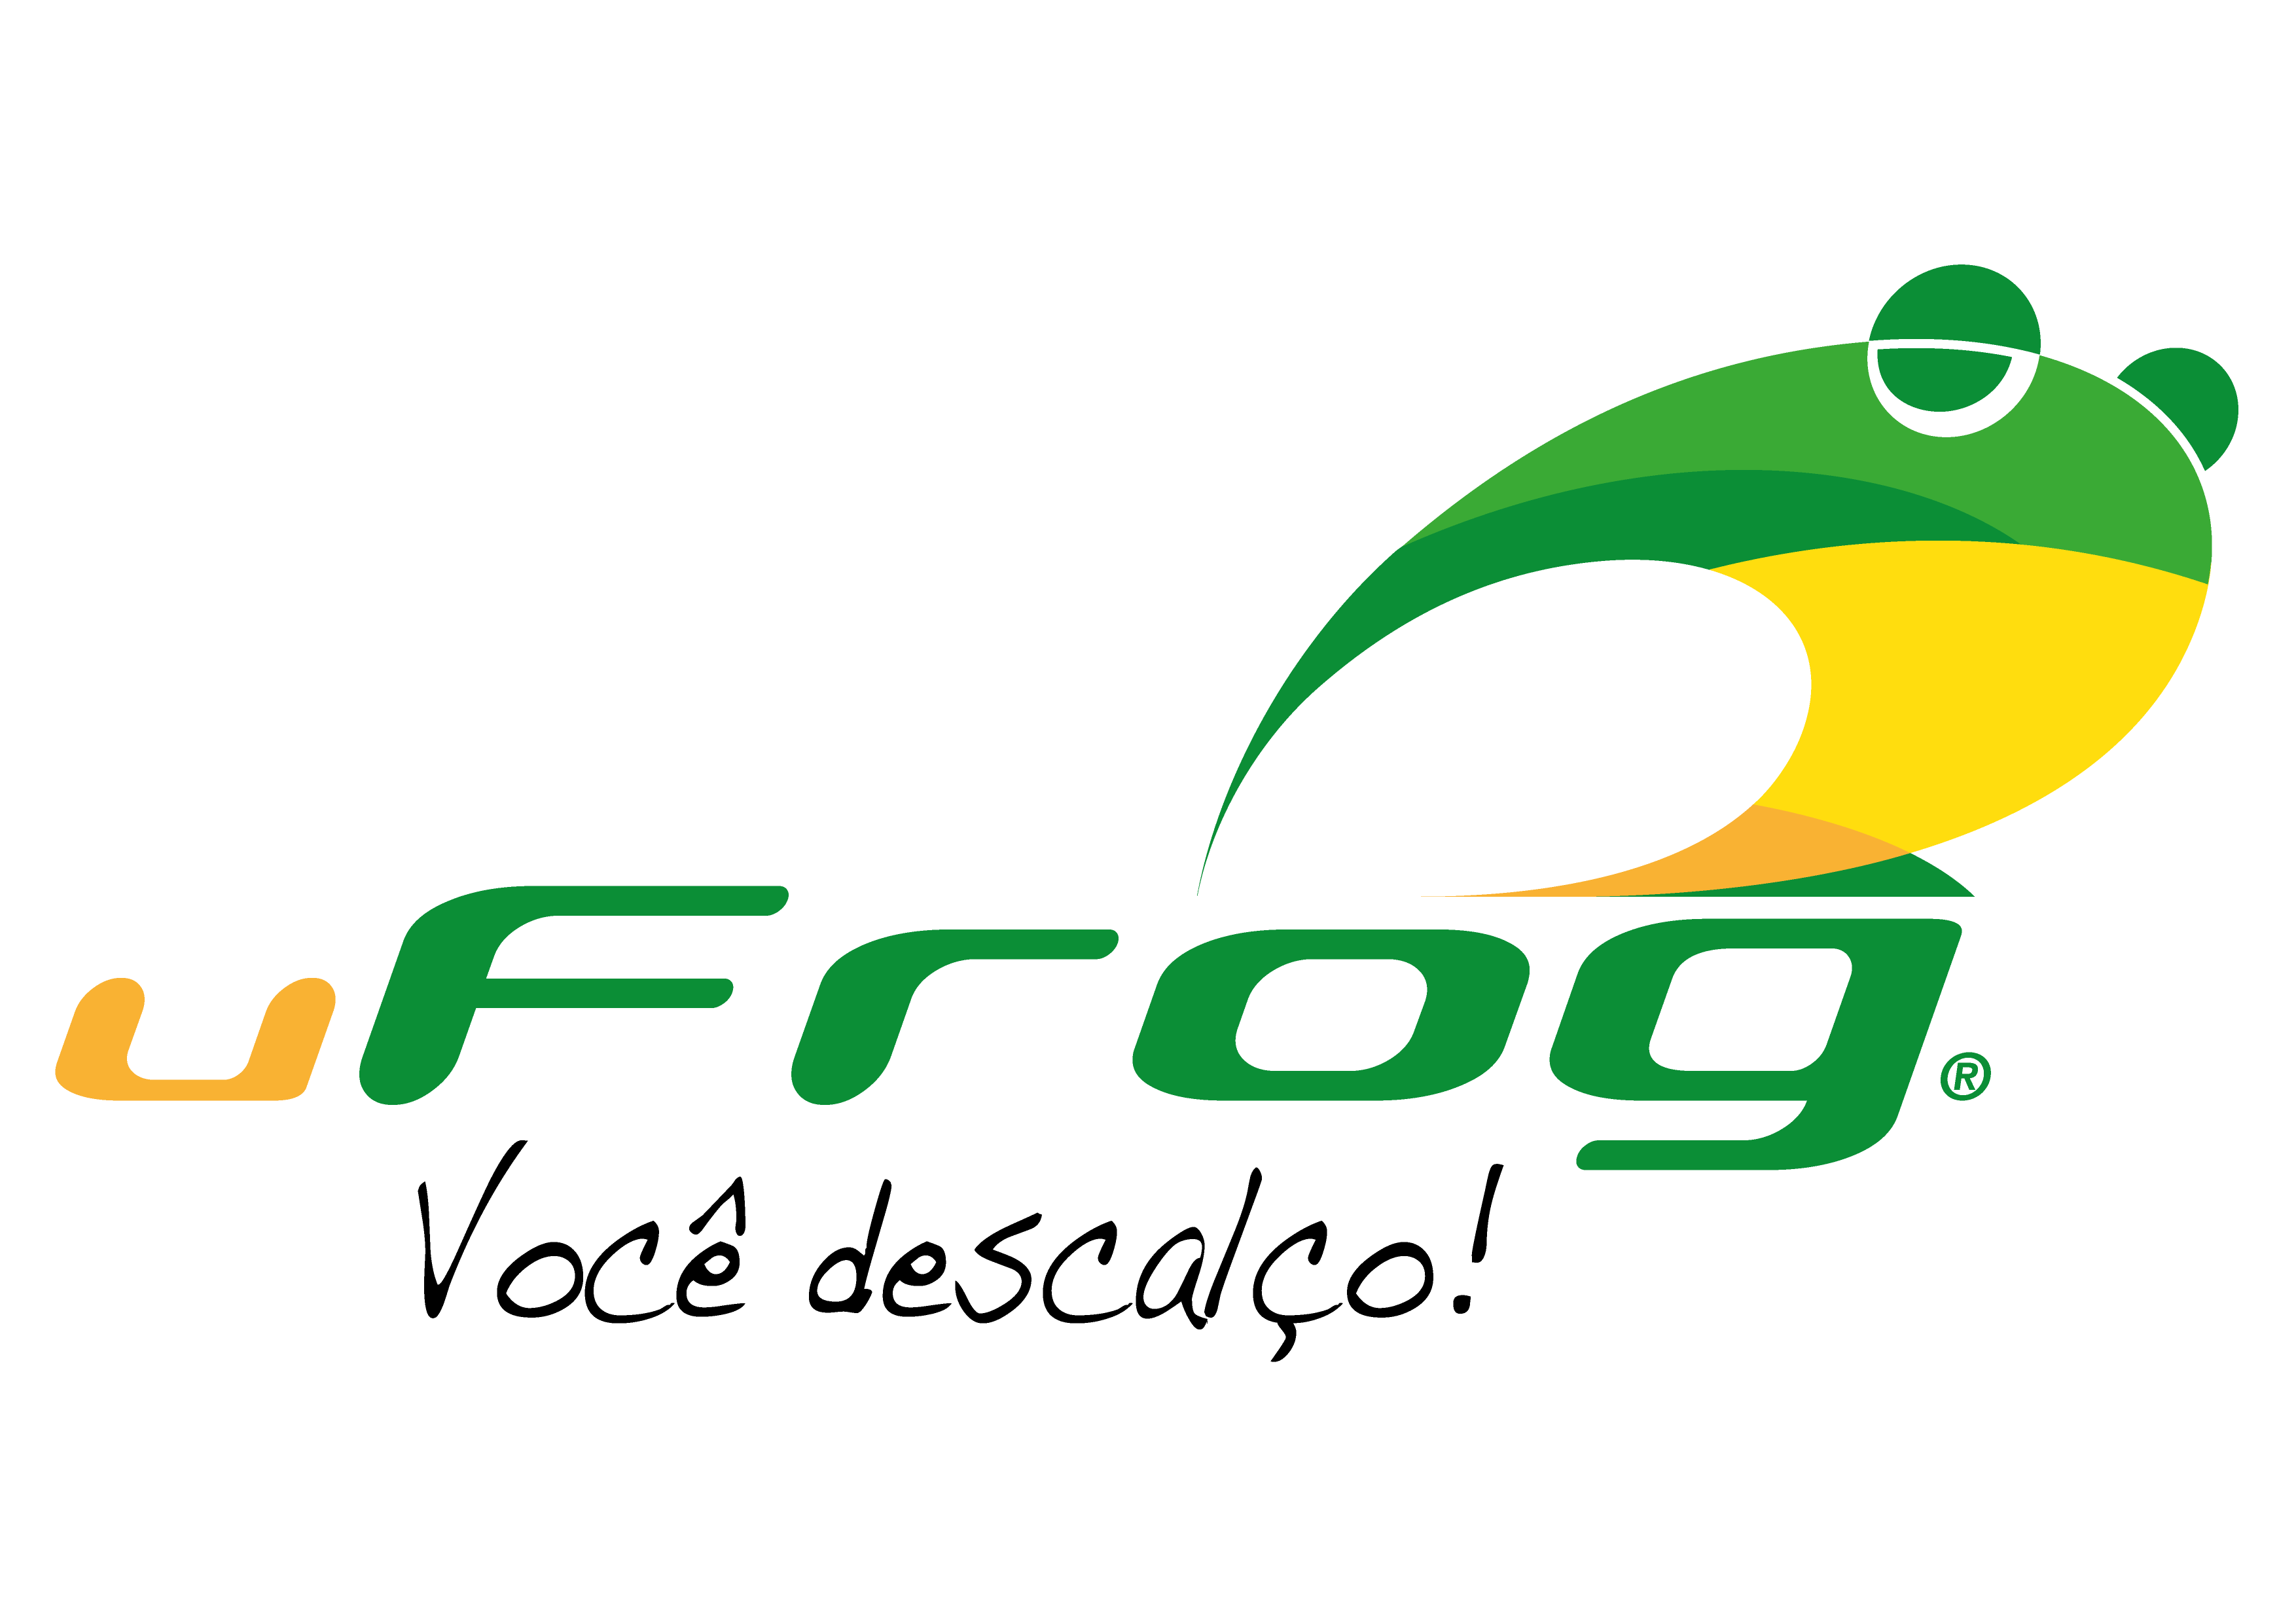 img/settings/logo-ufrog.png